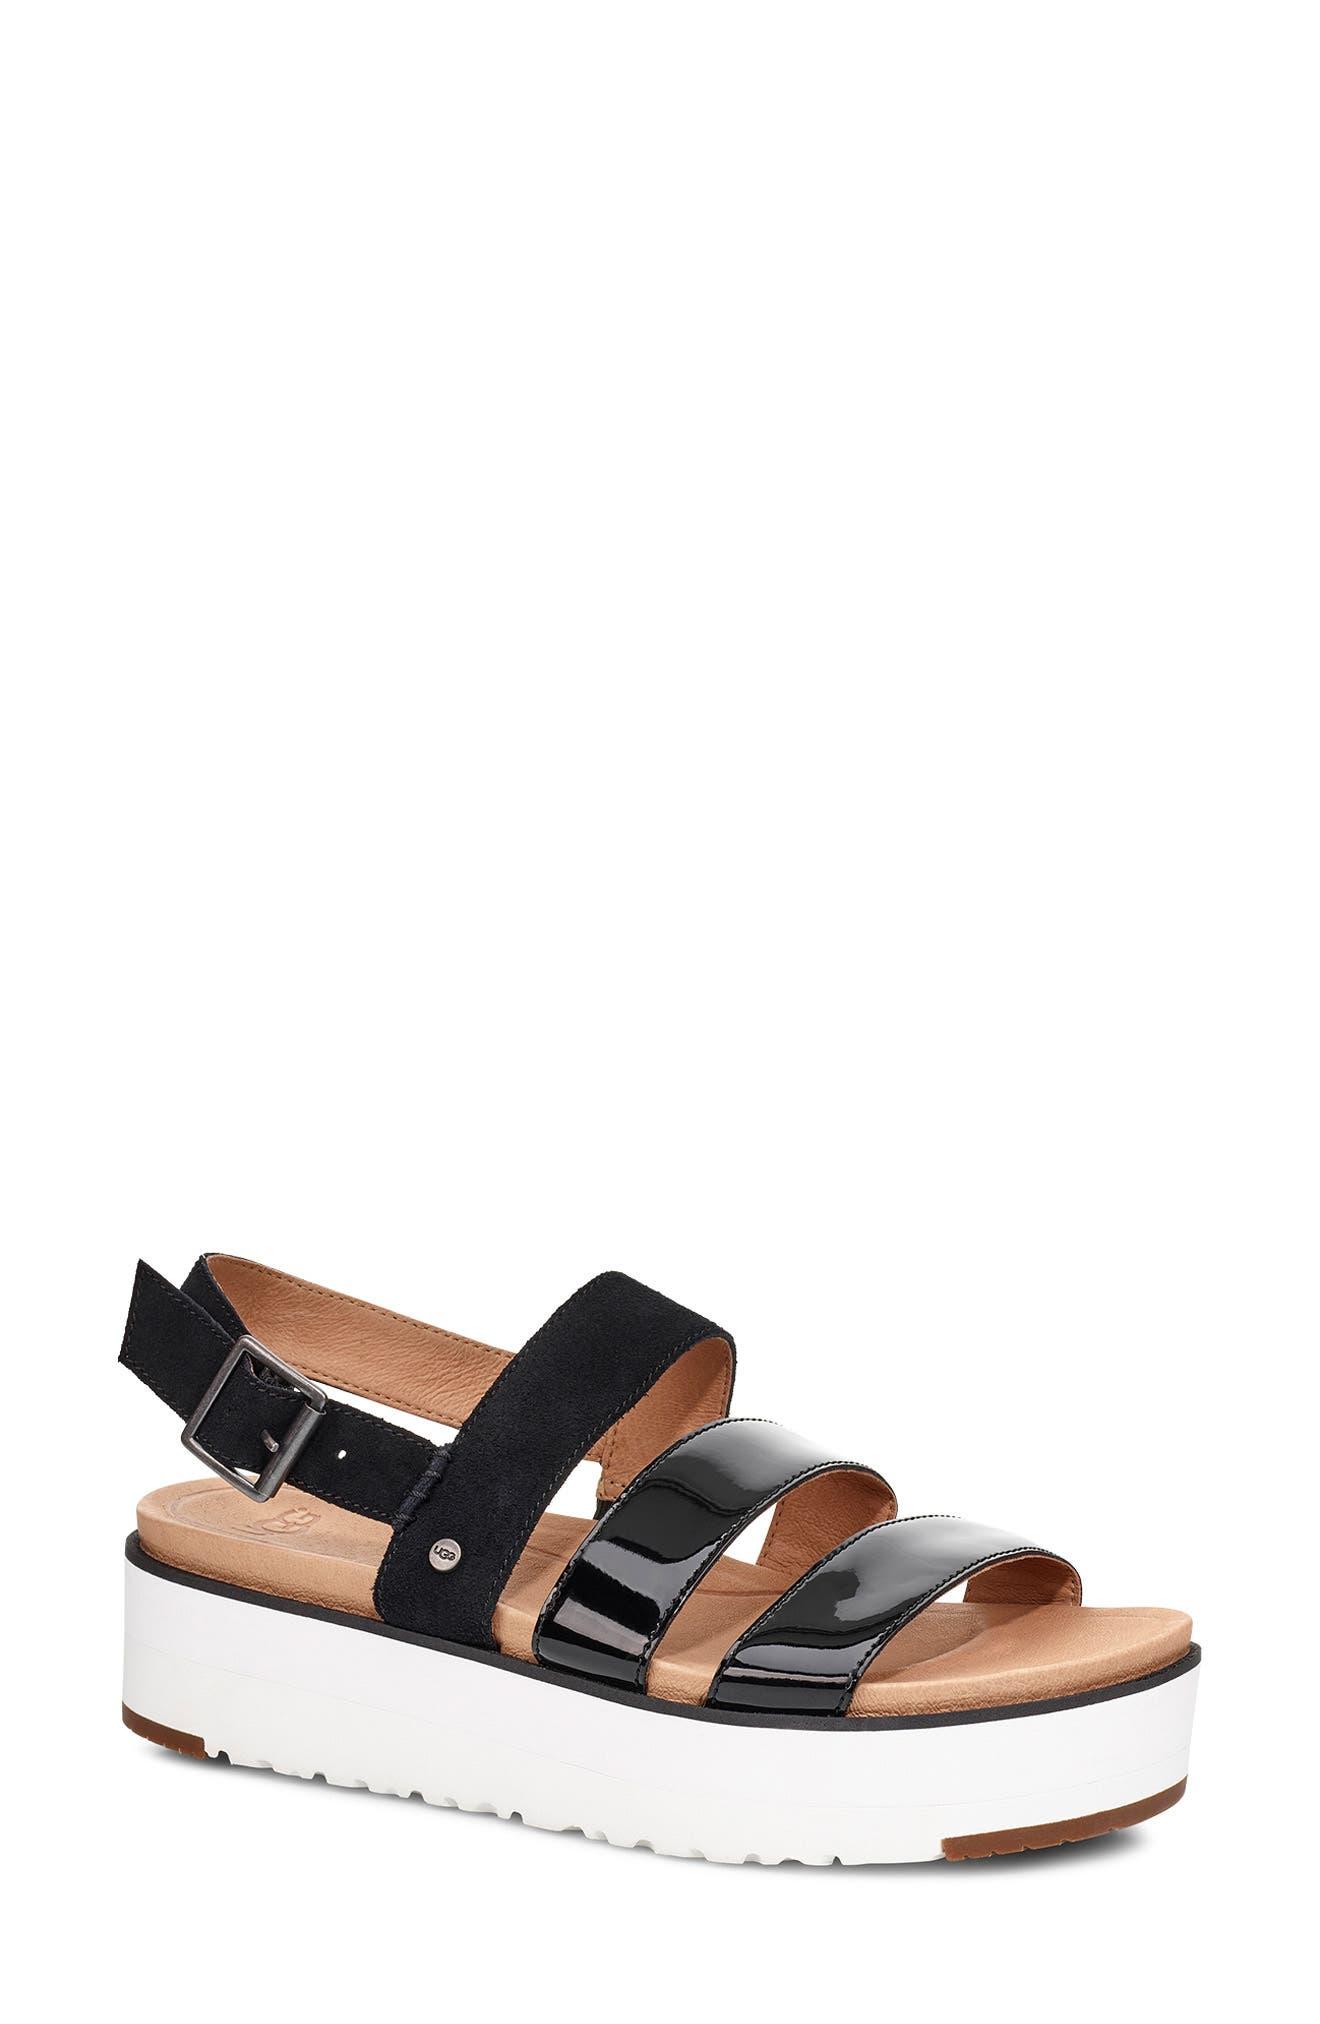 UGG<SUP>®</SUP>, Braelynn Flatform Sandal, Main thumbnail 1, color, BLACK LEATHER